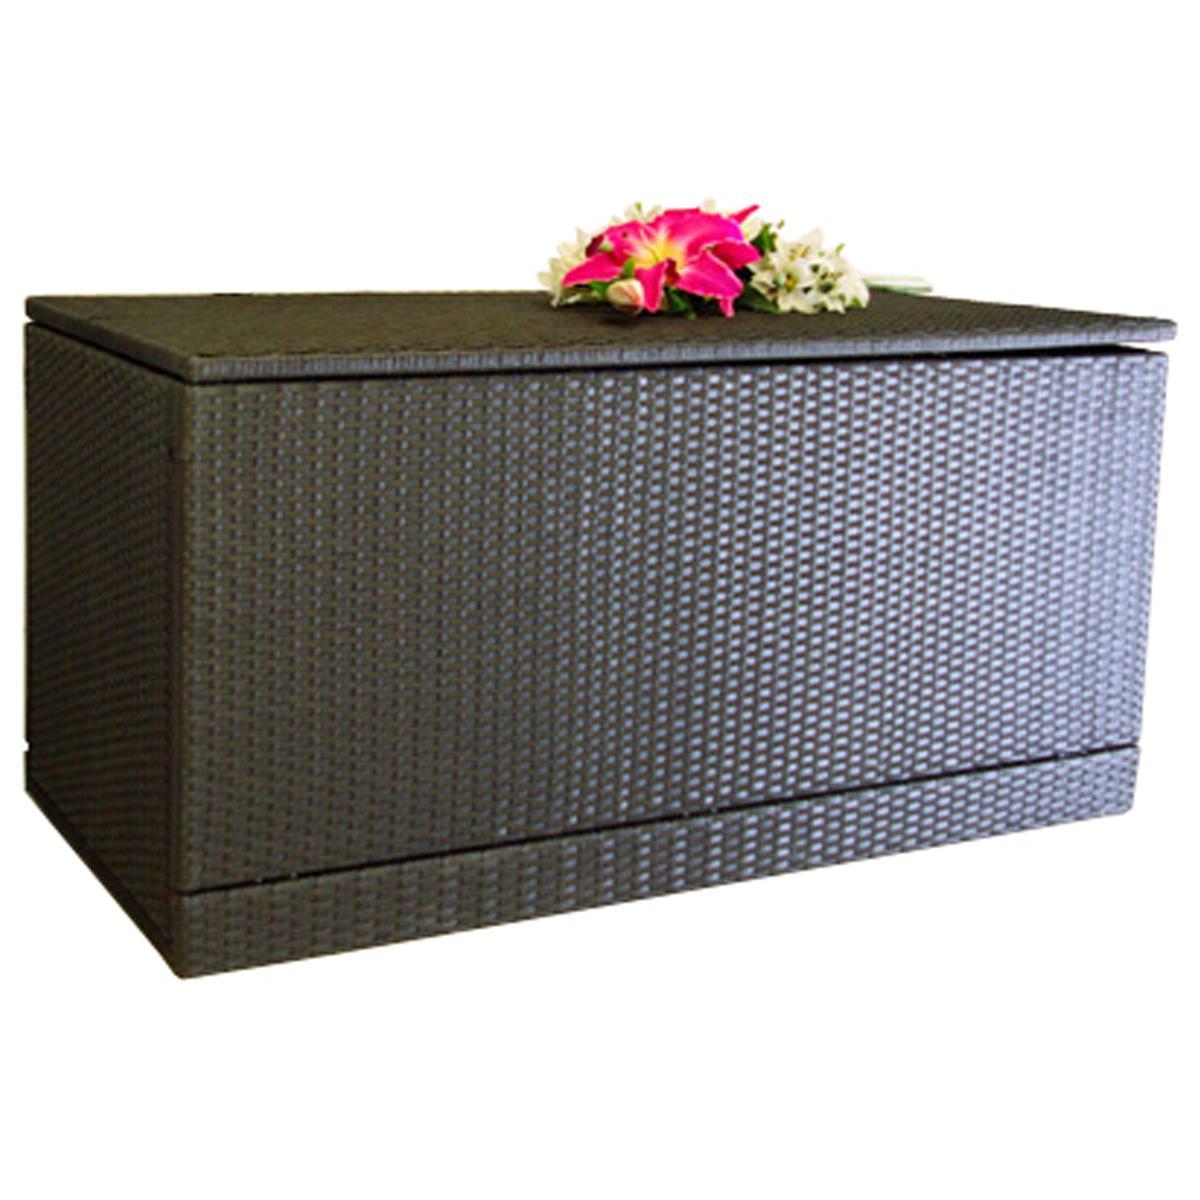 Wäschebox Kissenbox Wäschetruhe Truhe Box Rattanbox Rattan Auflagenbox